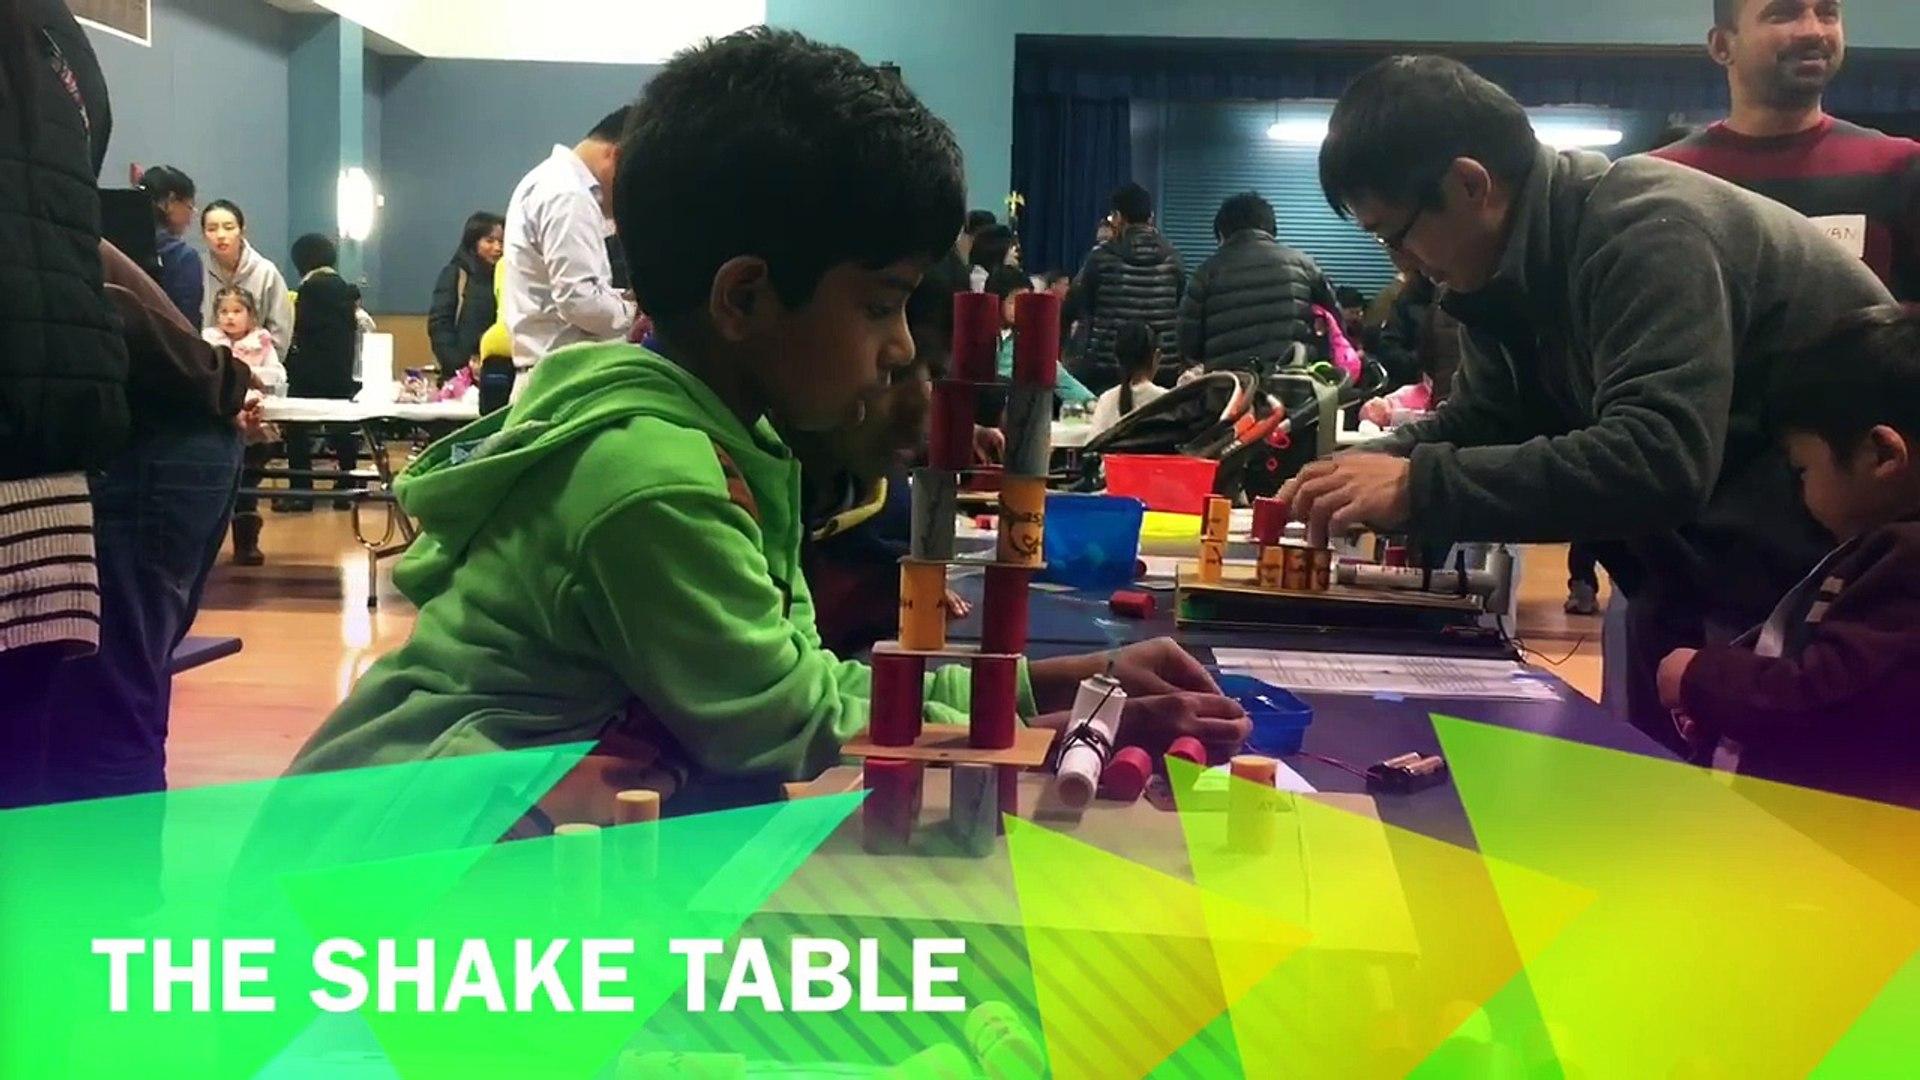 Family Math & Science Night Fun | Kids HD Video | Education |  School